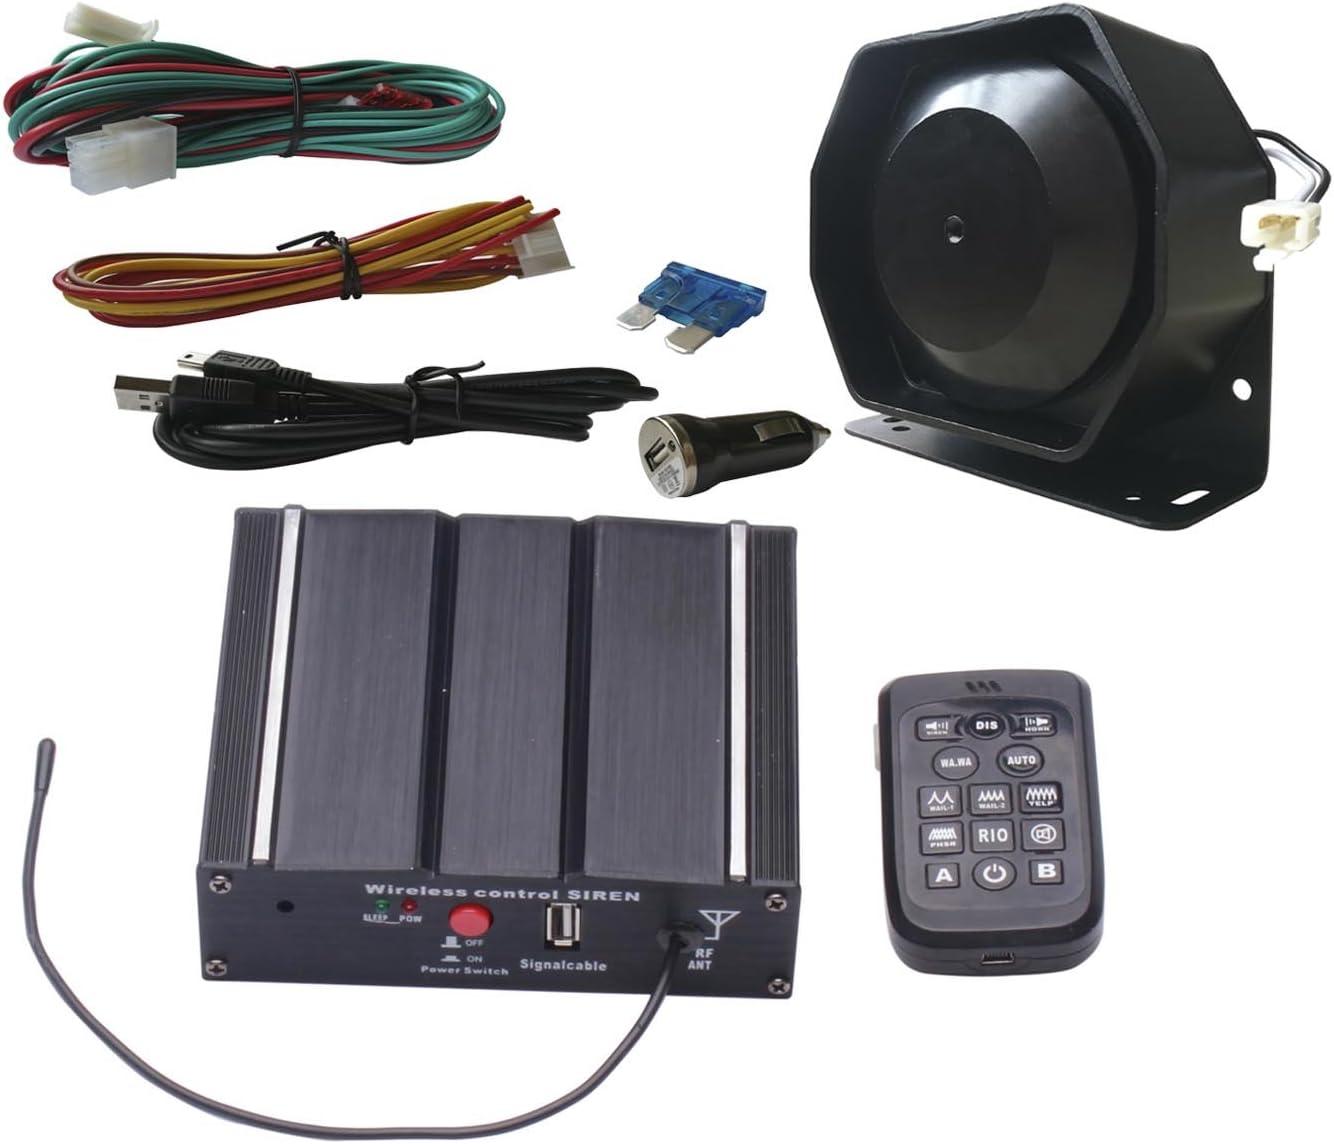 Como 100 W Federal sirena Kit as71005-spk0021, 3 unidades) 20 ...